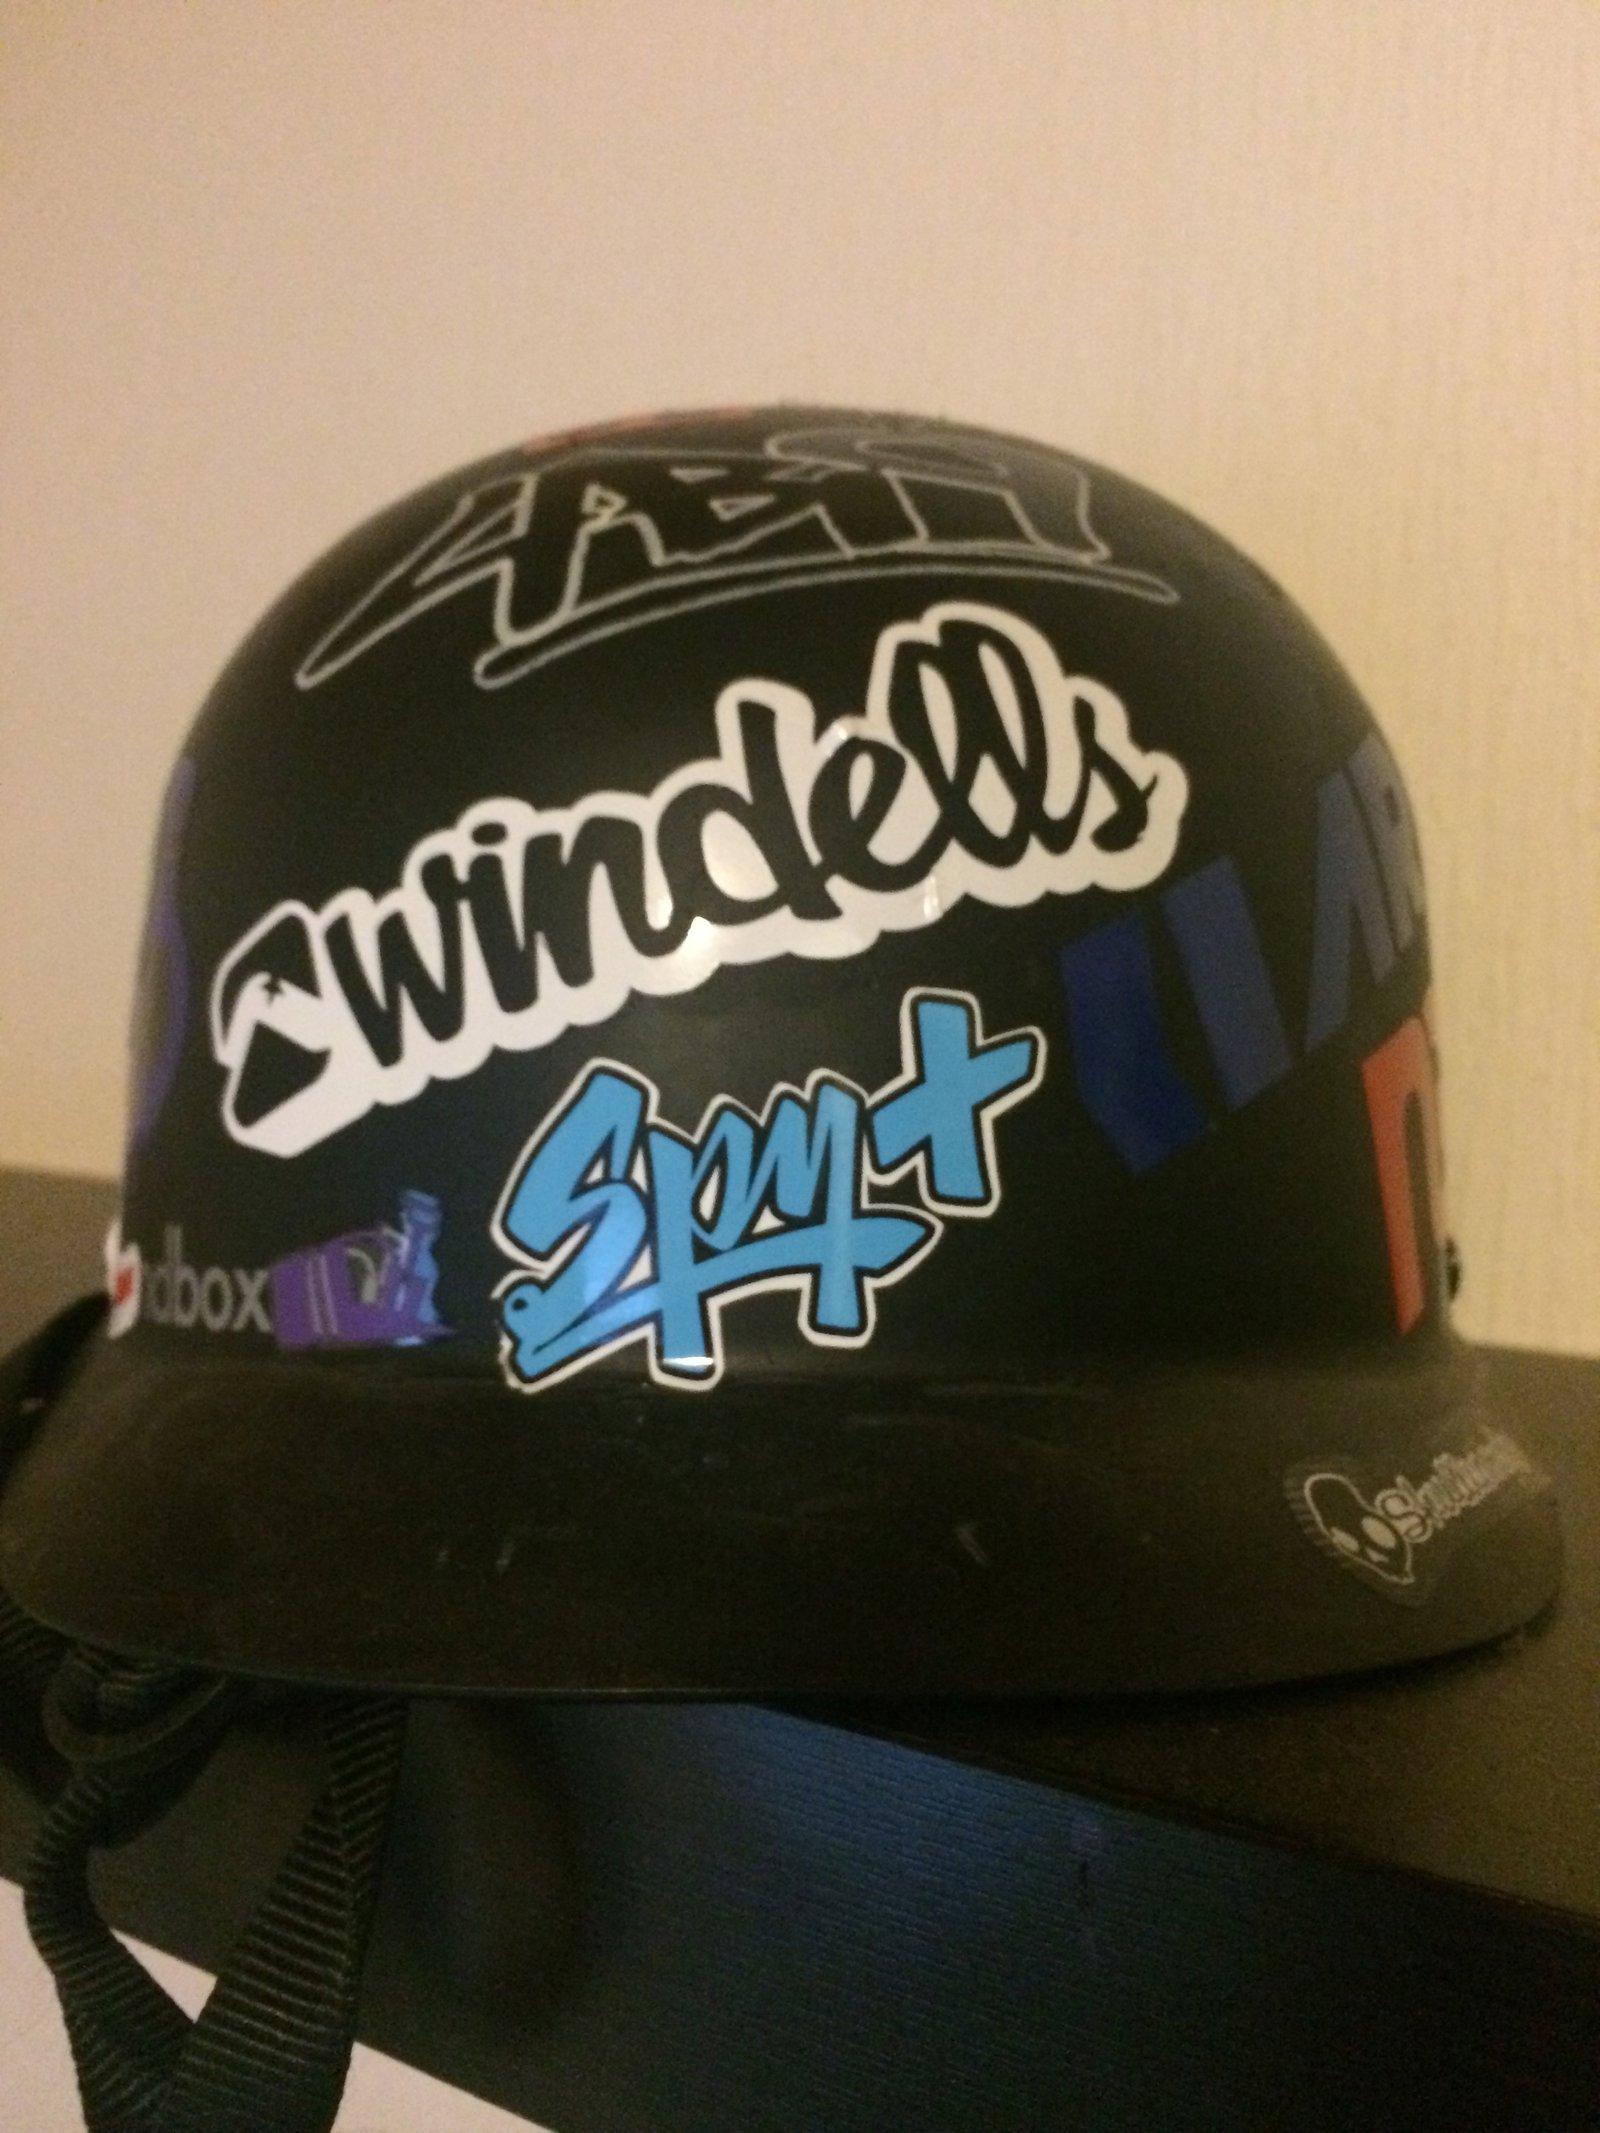 Xl Sandbox Helmet - For sale